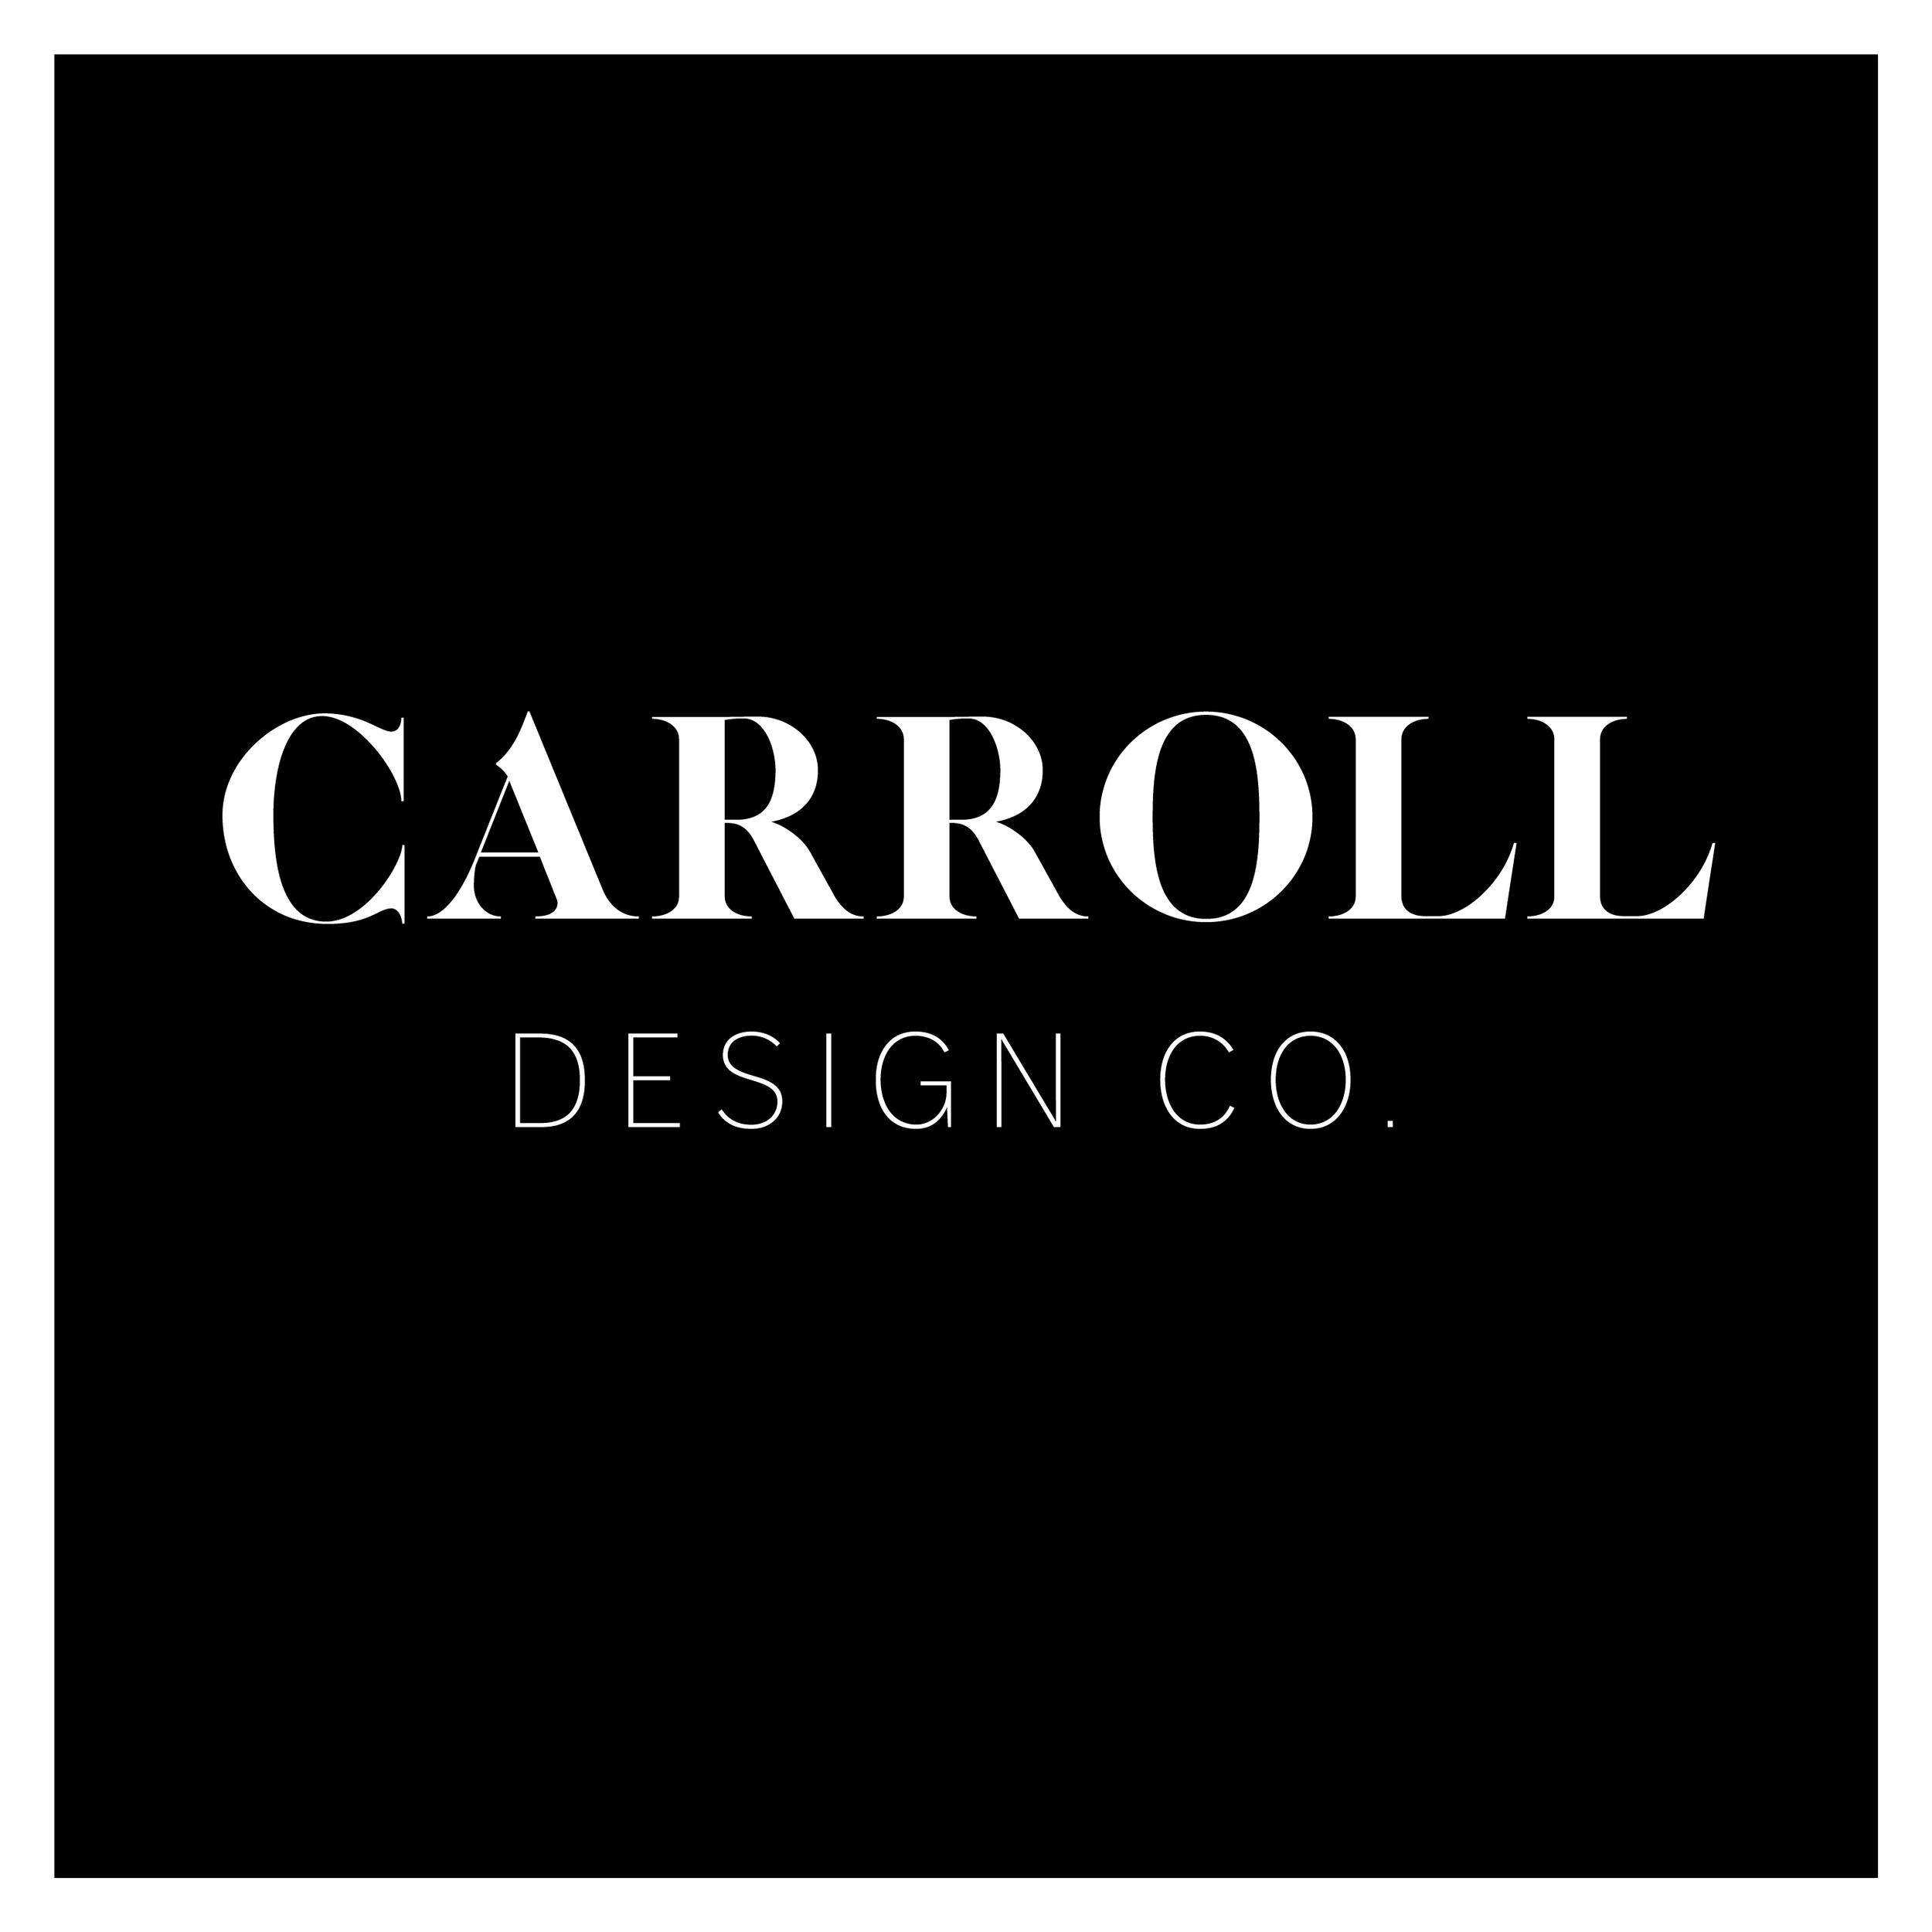 Carroll Design Co.